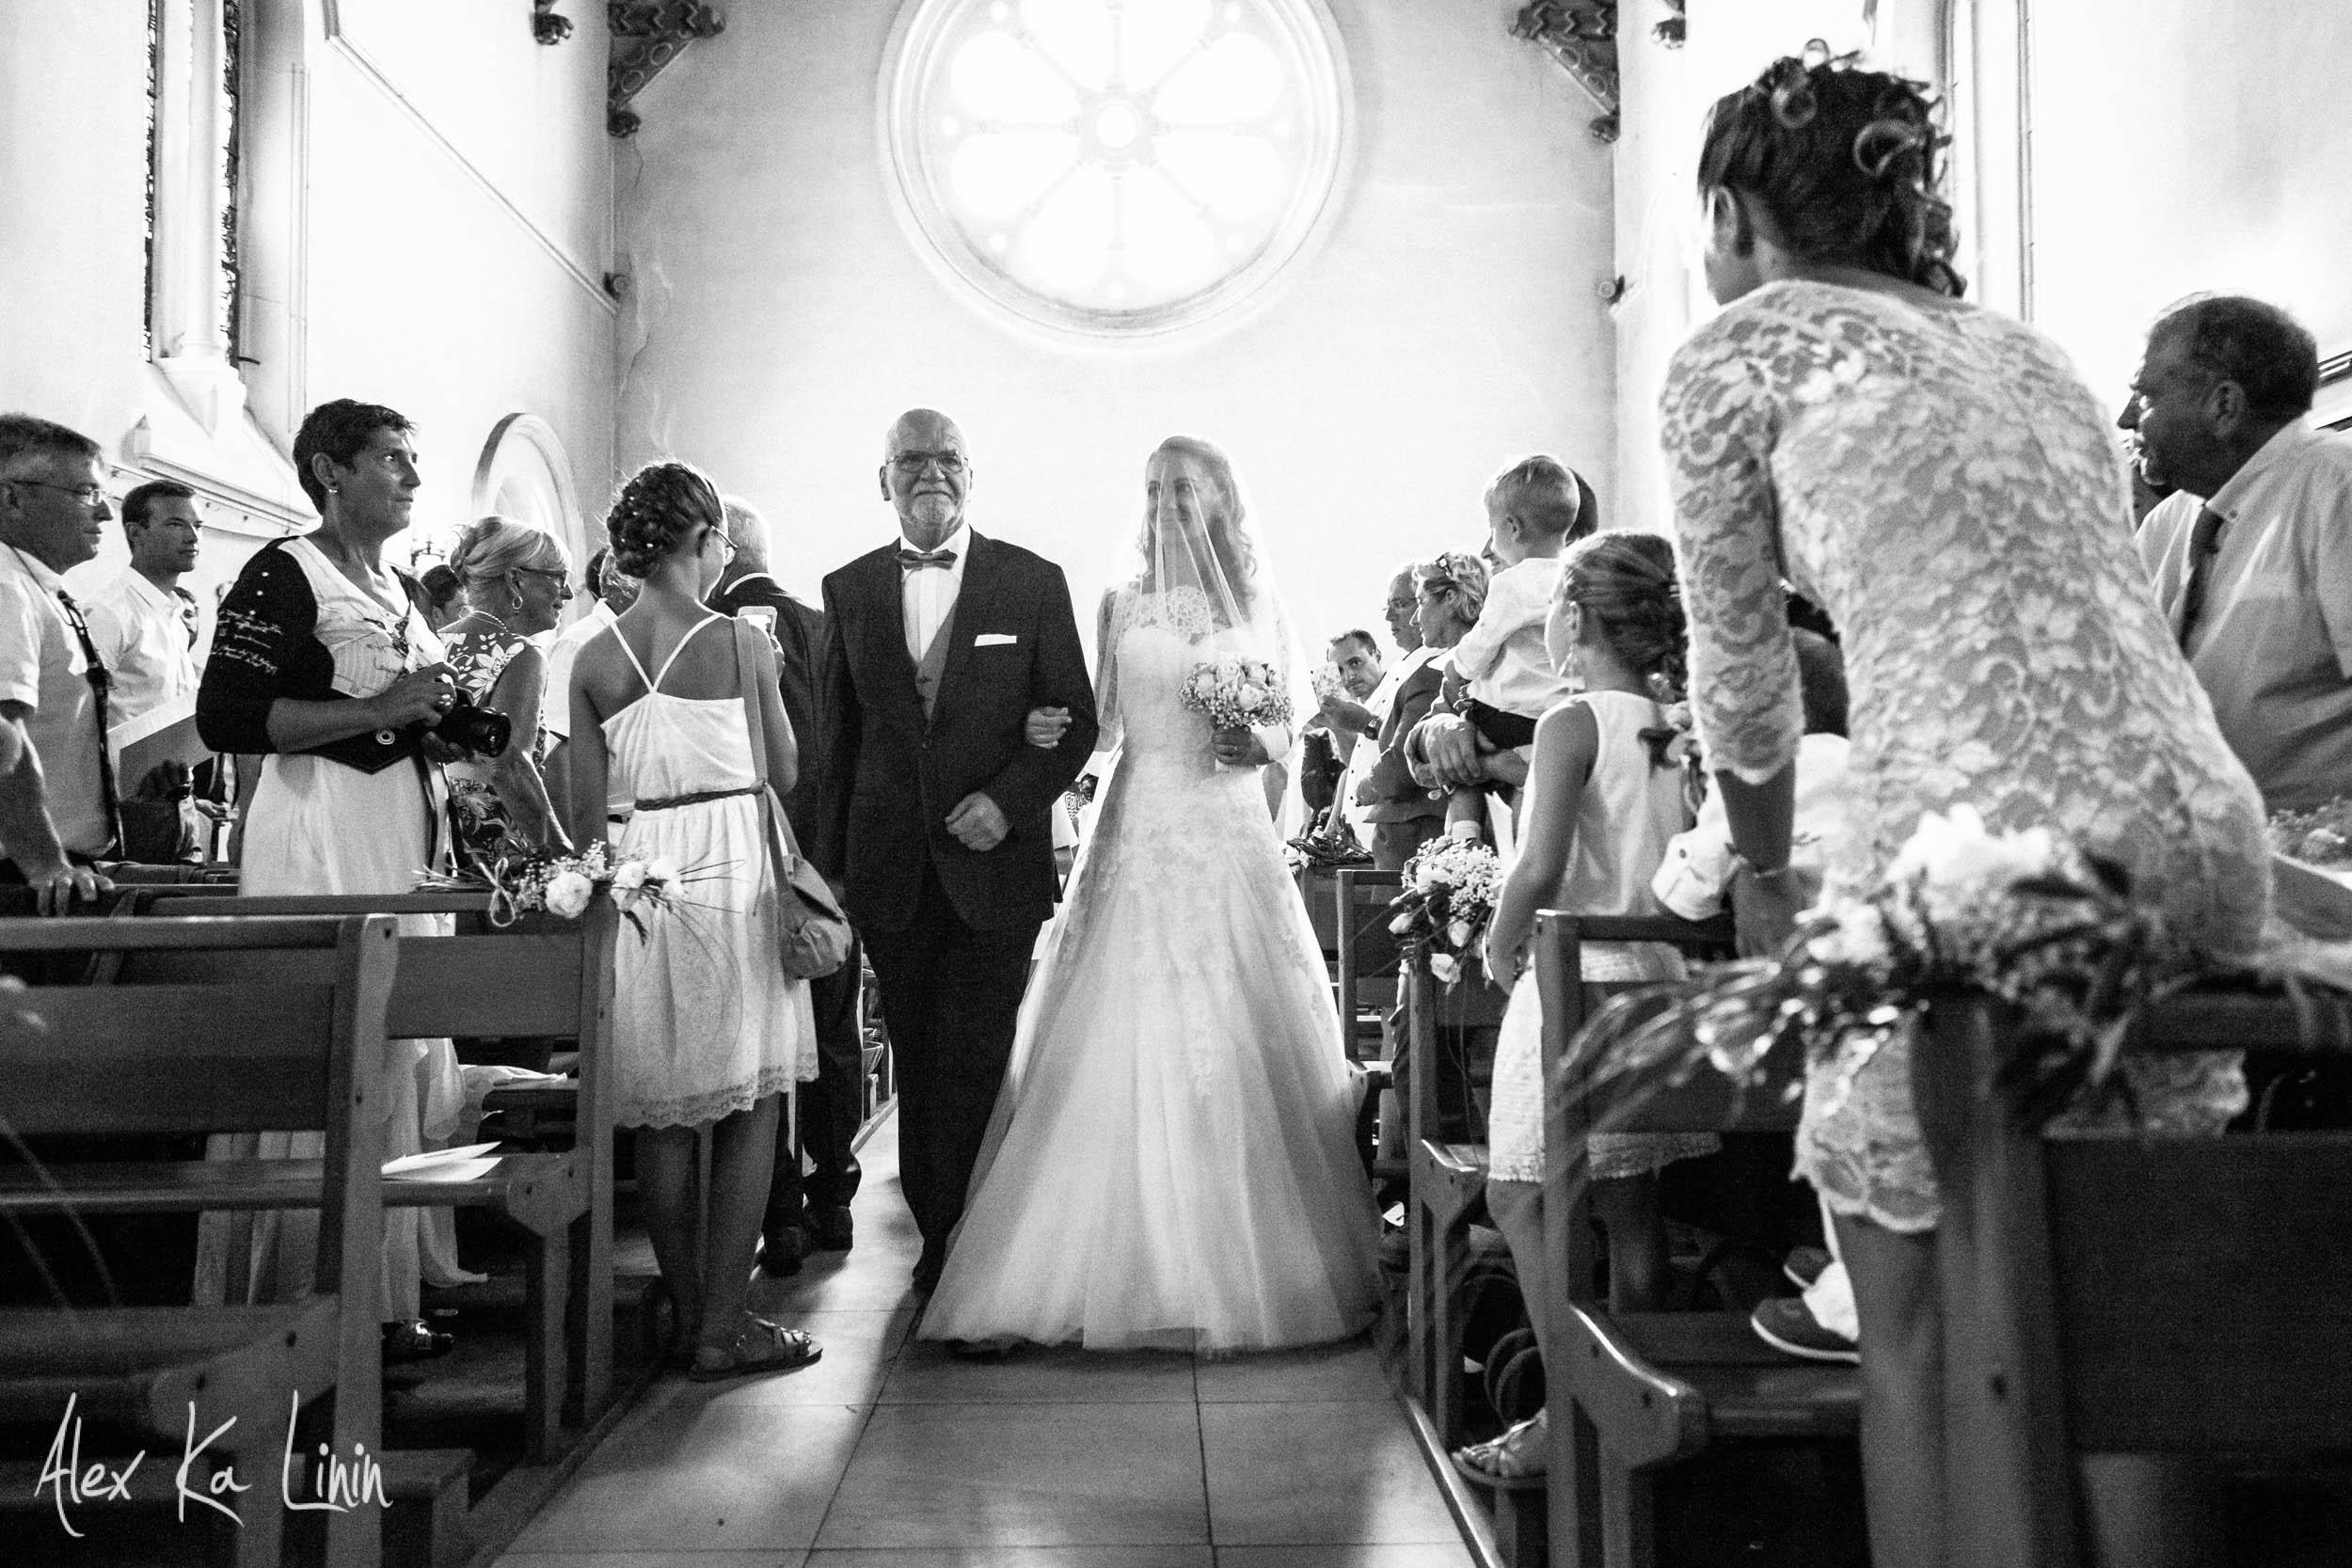 AlexKa_wedding_mariage_photographer-23.jpg